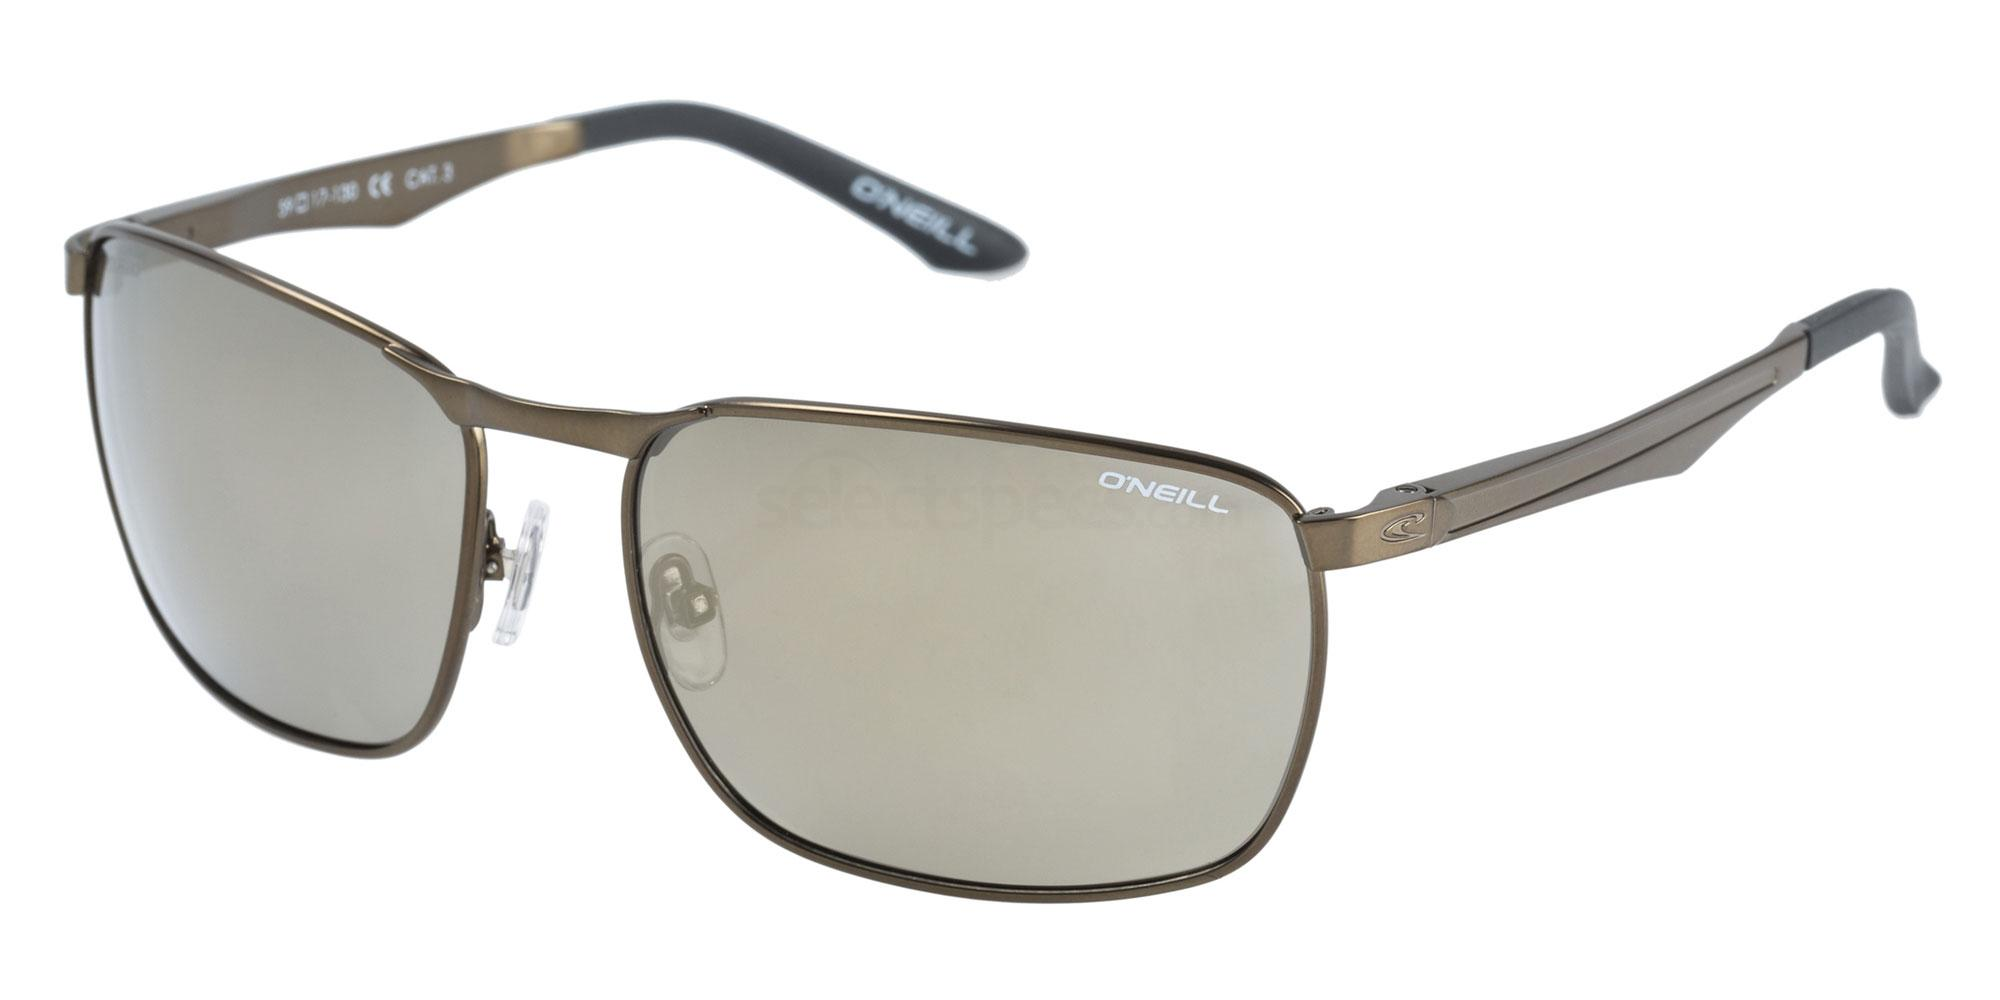 003P ONS-BILLOW Sunglasses, O'Neill